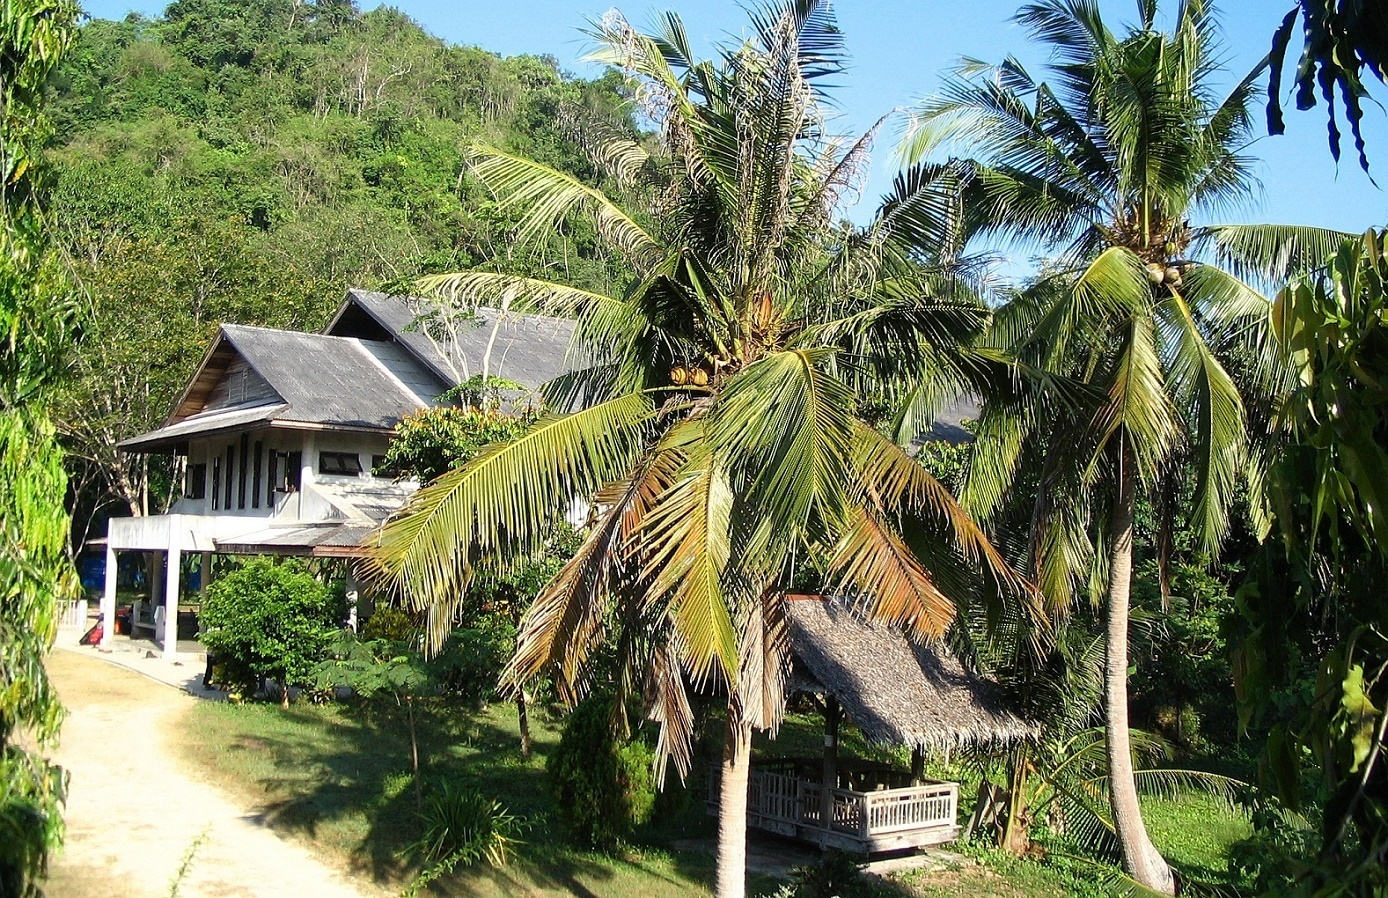 Jídelna ve Wat Suan Mokkh - Thajsko